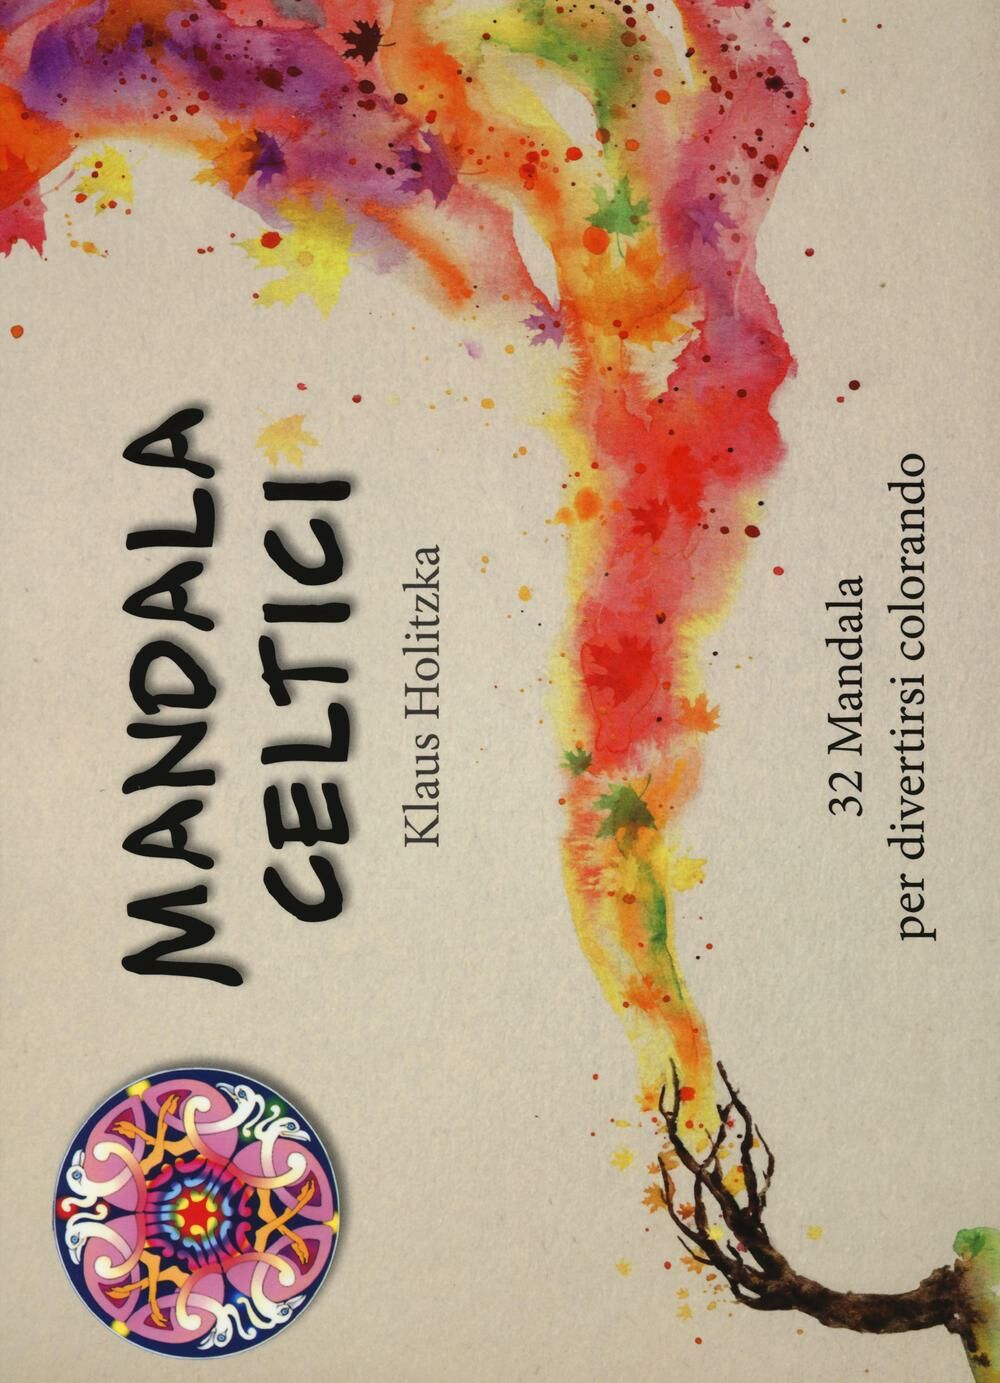 Mandala celtici. 32 mandala per divertirsi colorando